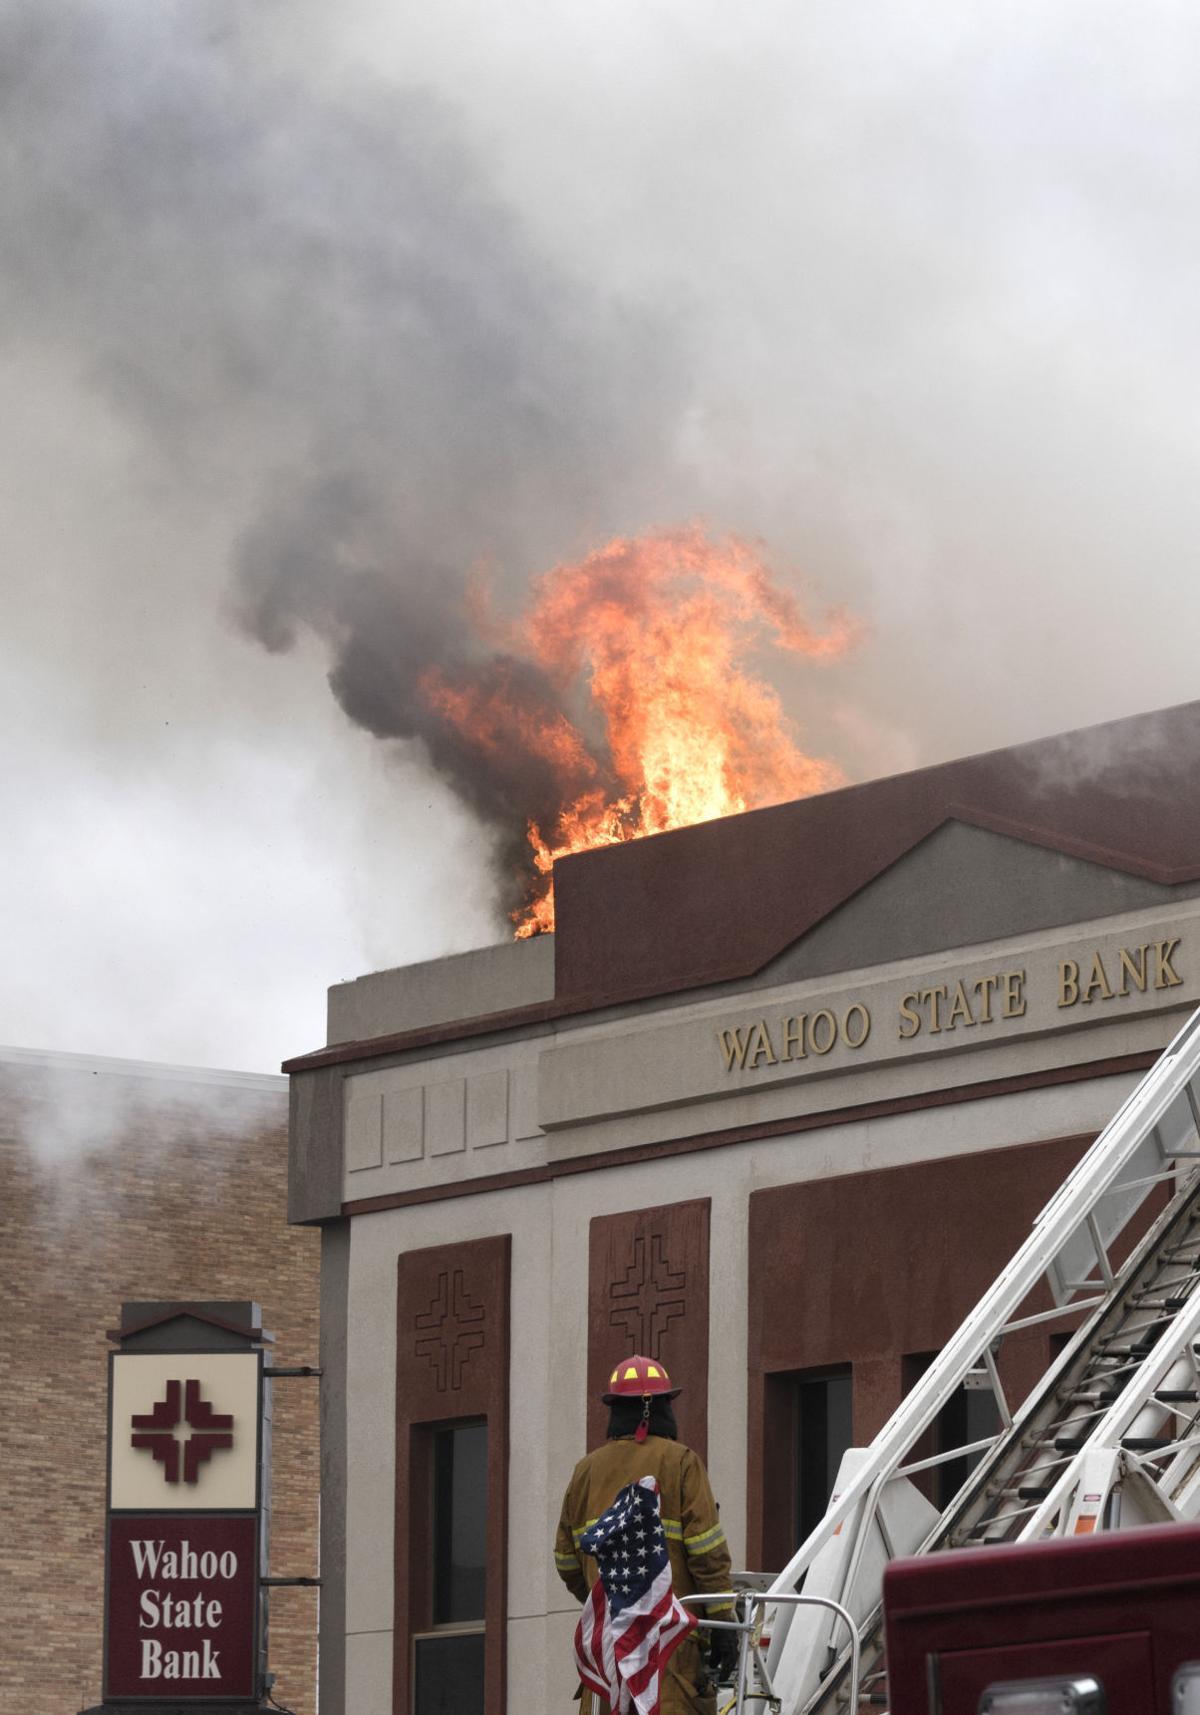 wahoo state bank gutted by fire nebraska news. Black Bedroom Furniture Sets. Home Design Ideas